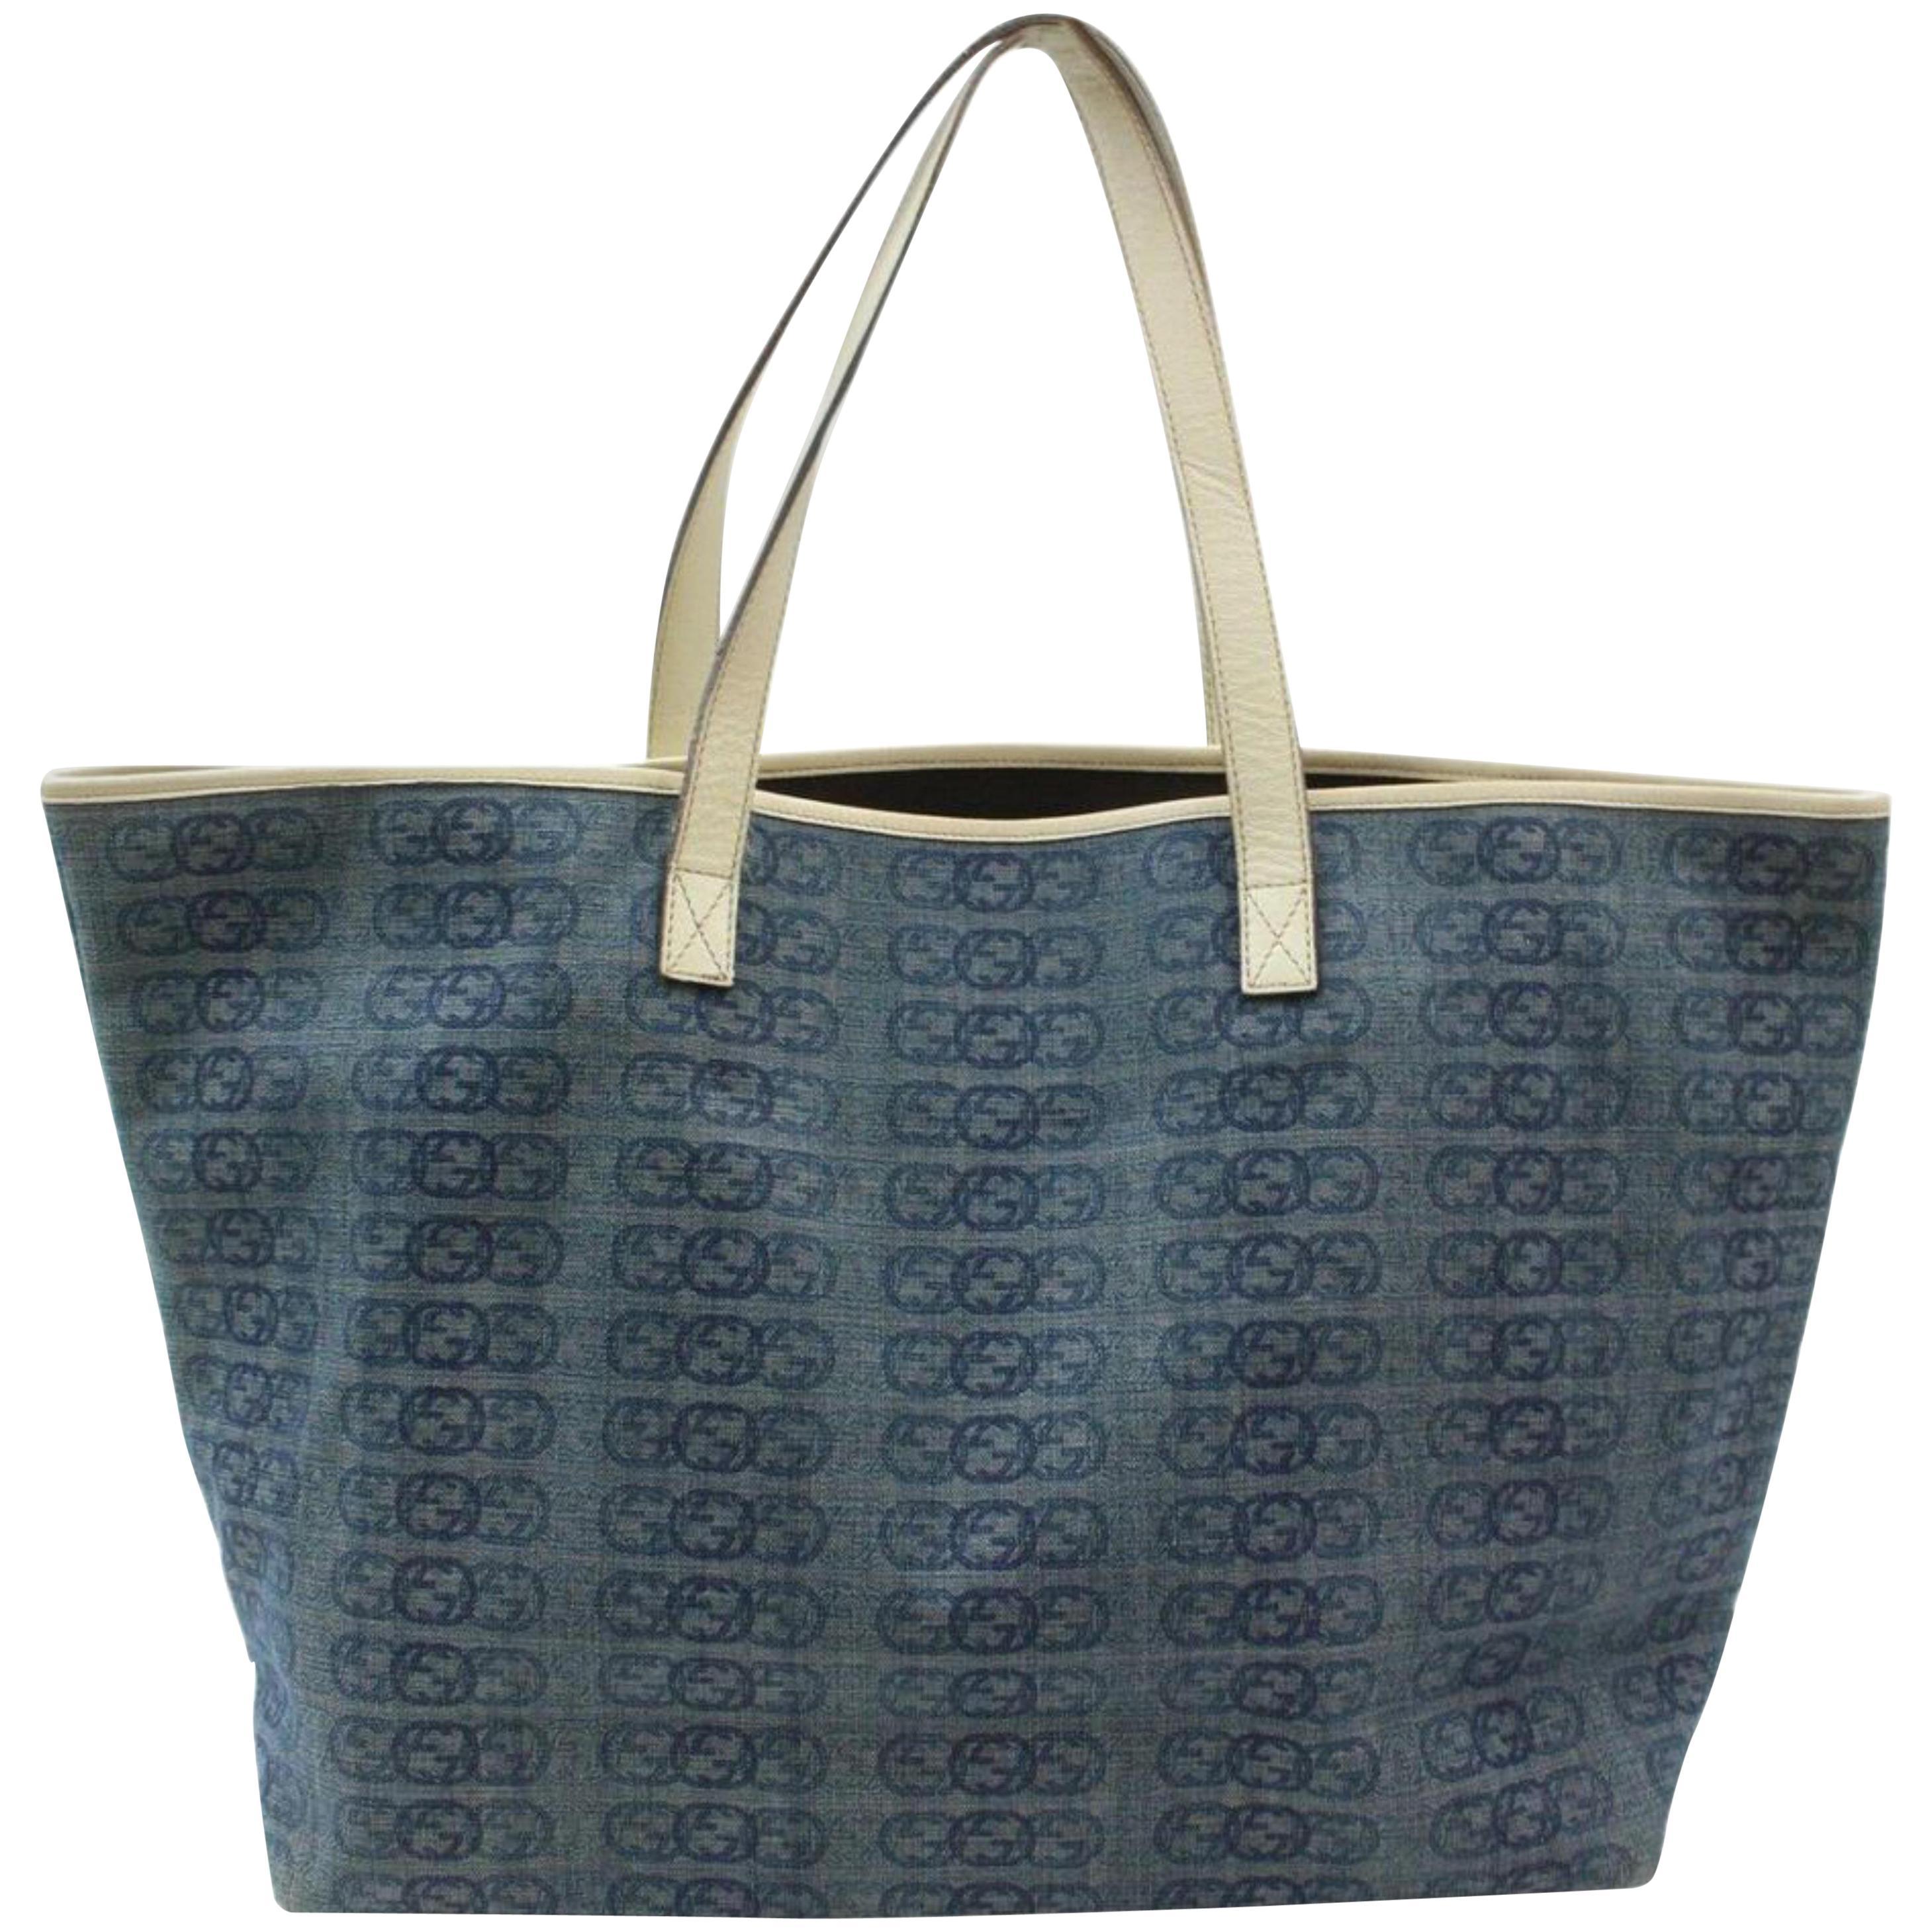 c7c831f2829 Vintage Gucci Handbags and Purses - 2